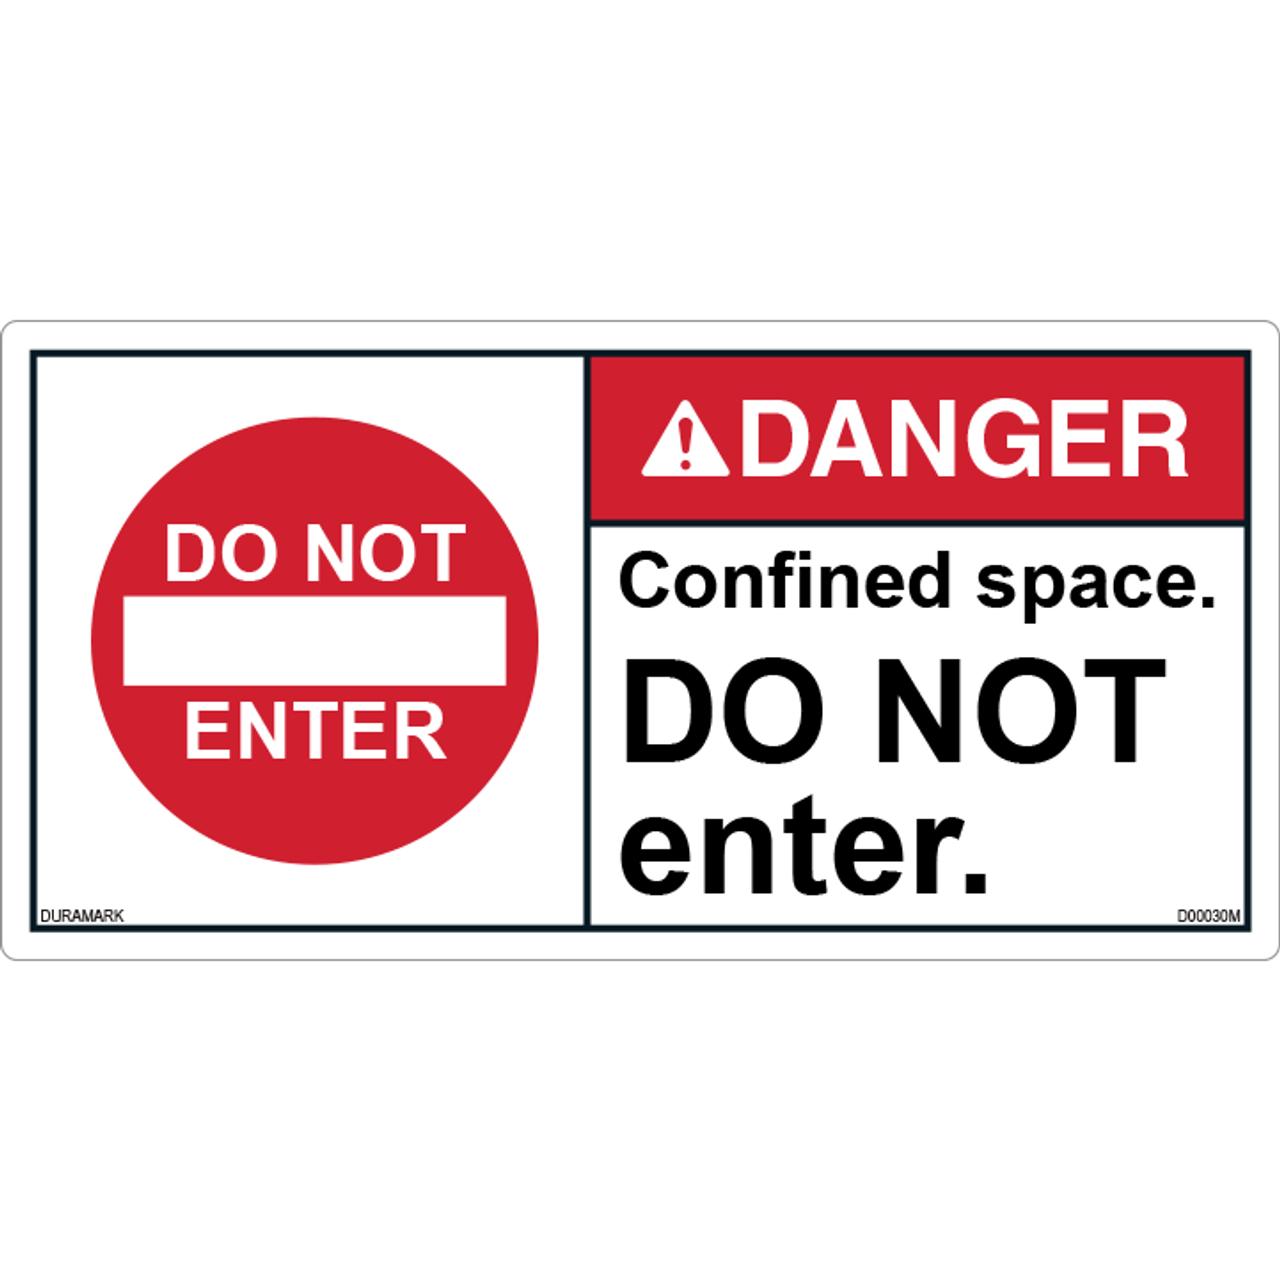 ANSI Safety Label - Danger - Confined Space - Do Not Enter